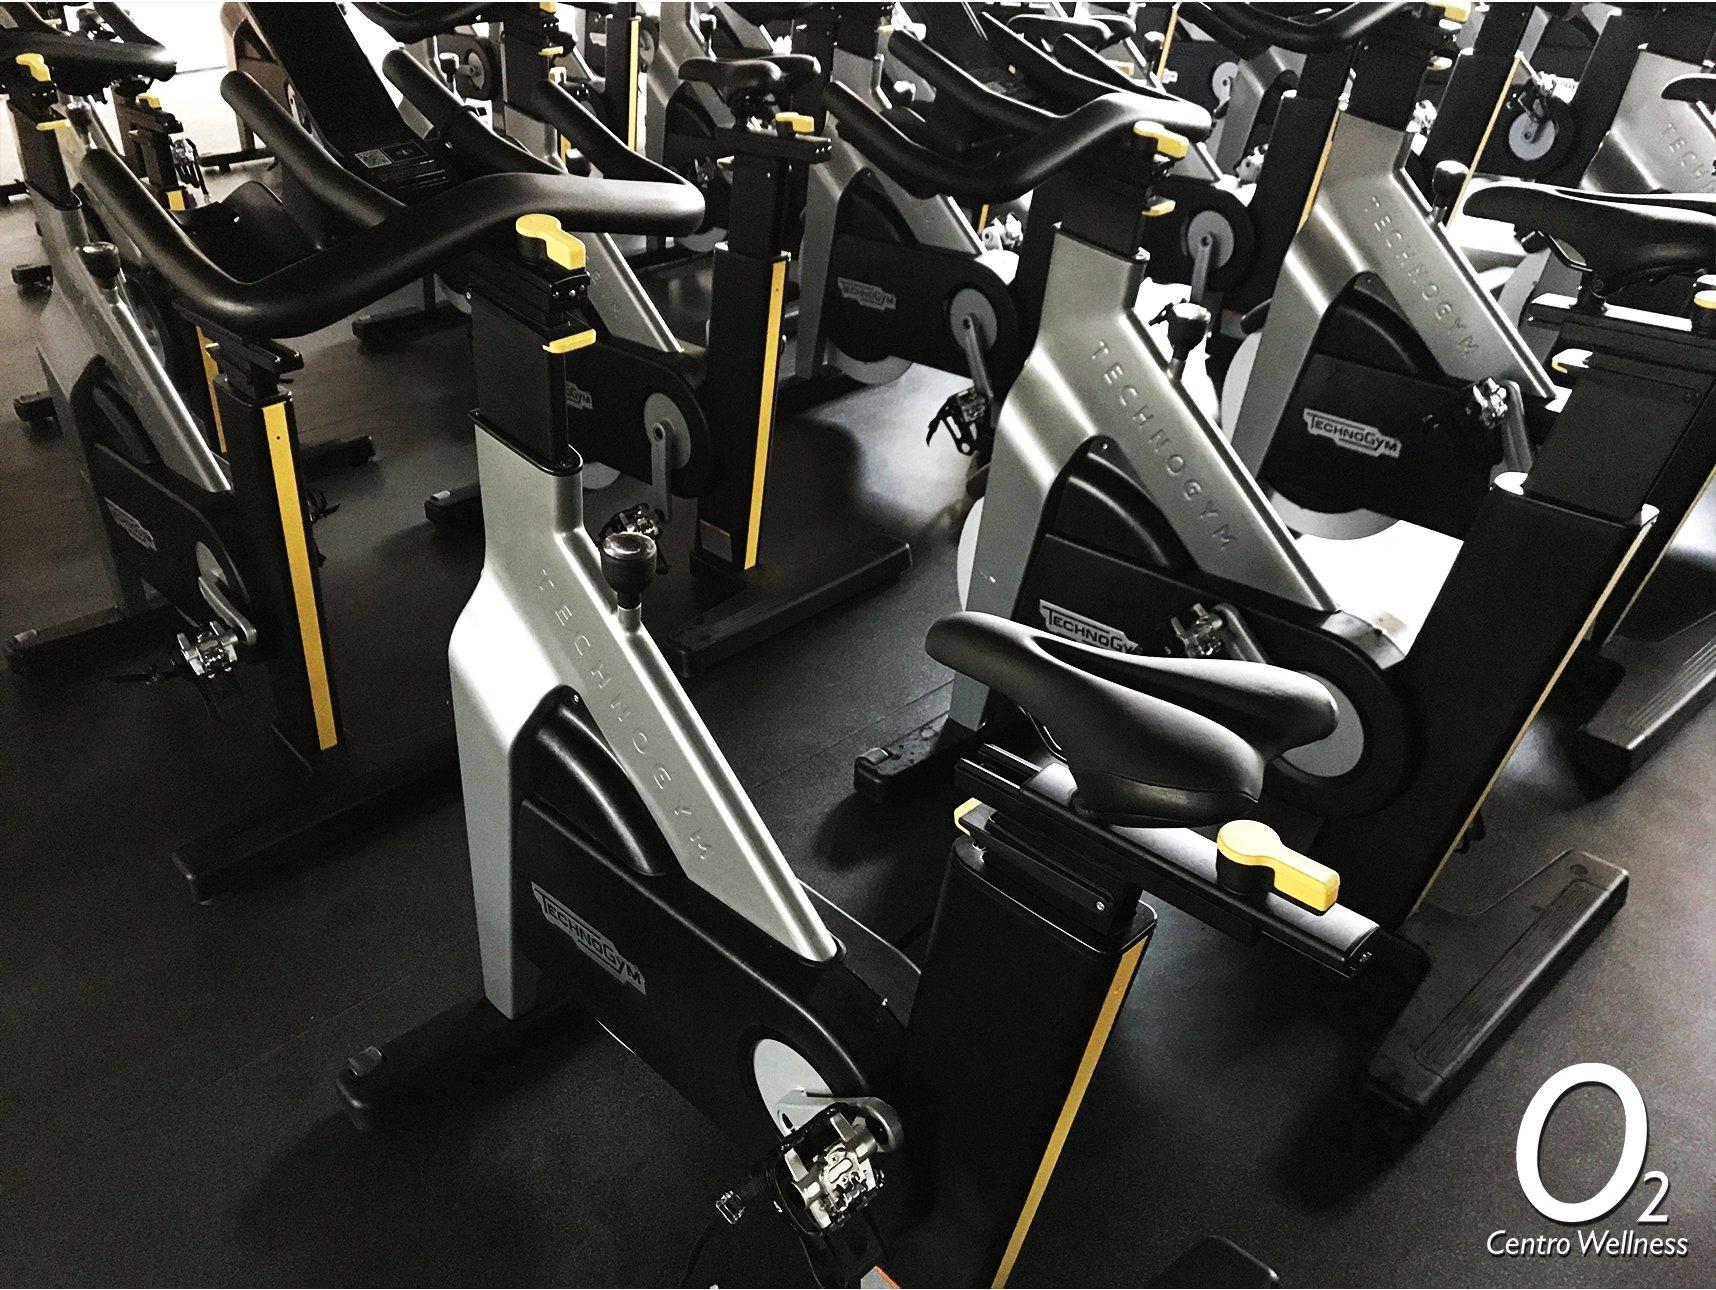 Saca el m ximo partido a las bicis de la wellness for Gimnasio o2